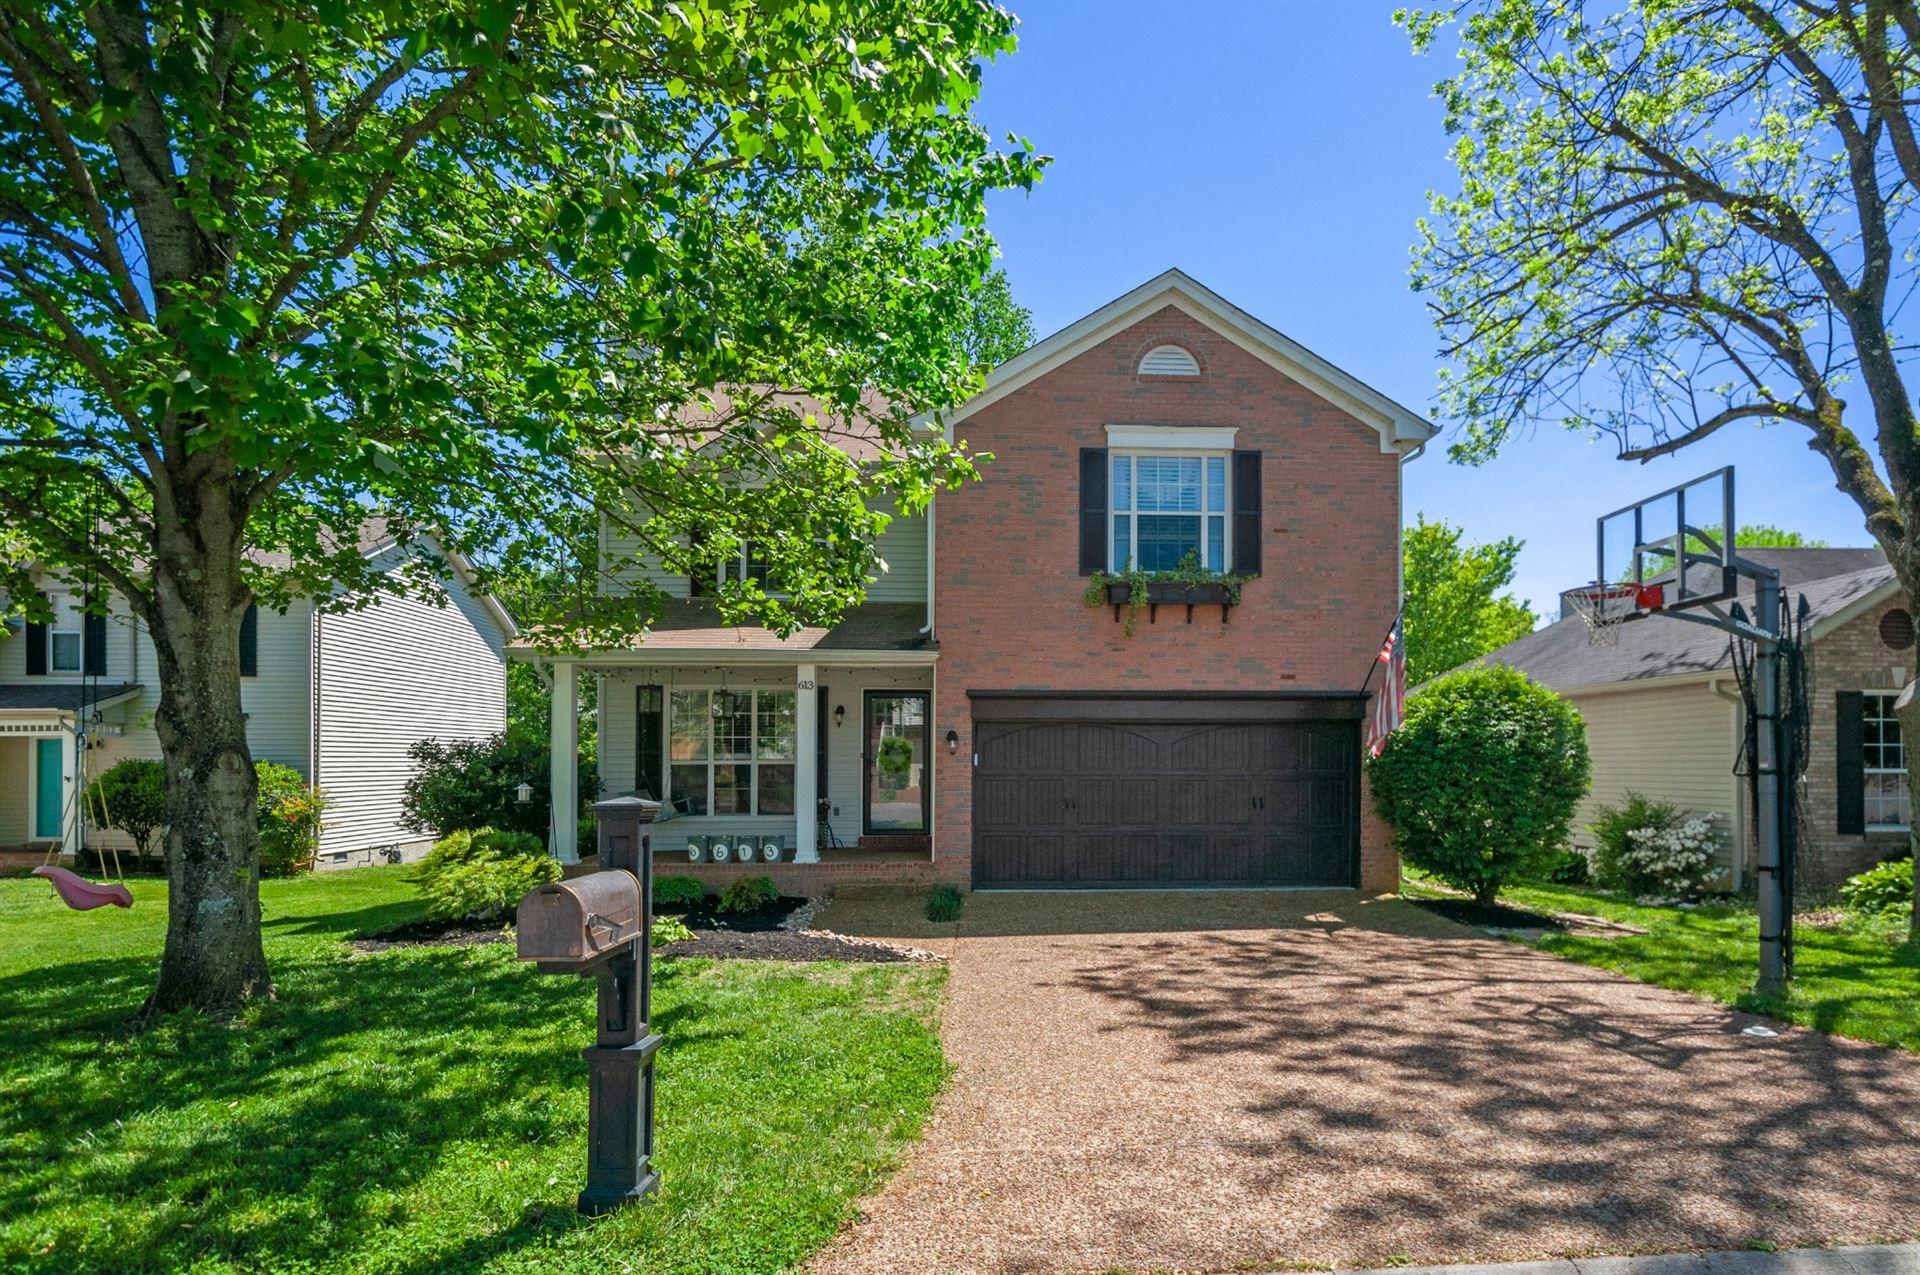 613 Granwood Blvd, Old Hickory, TN 37138 - MLS#: 2250097